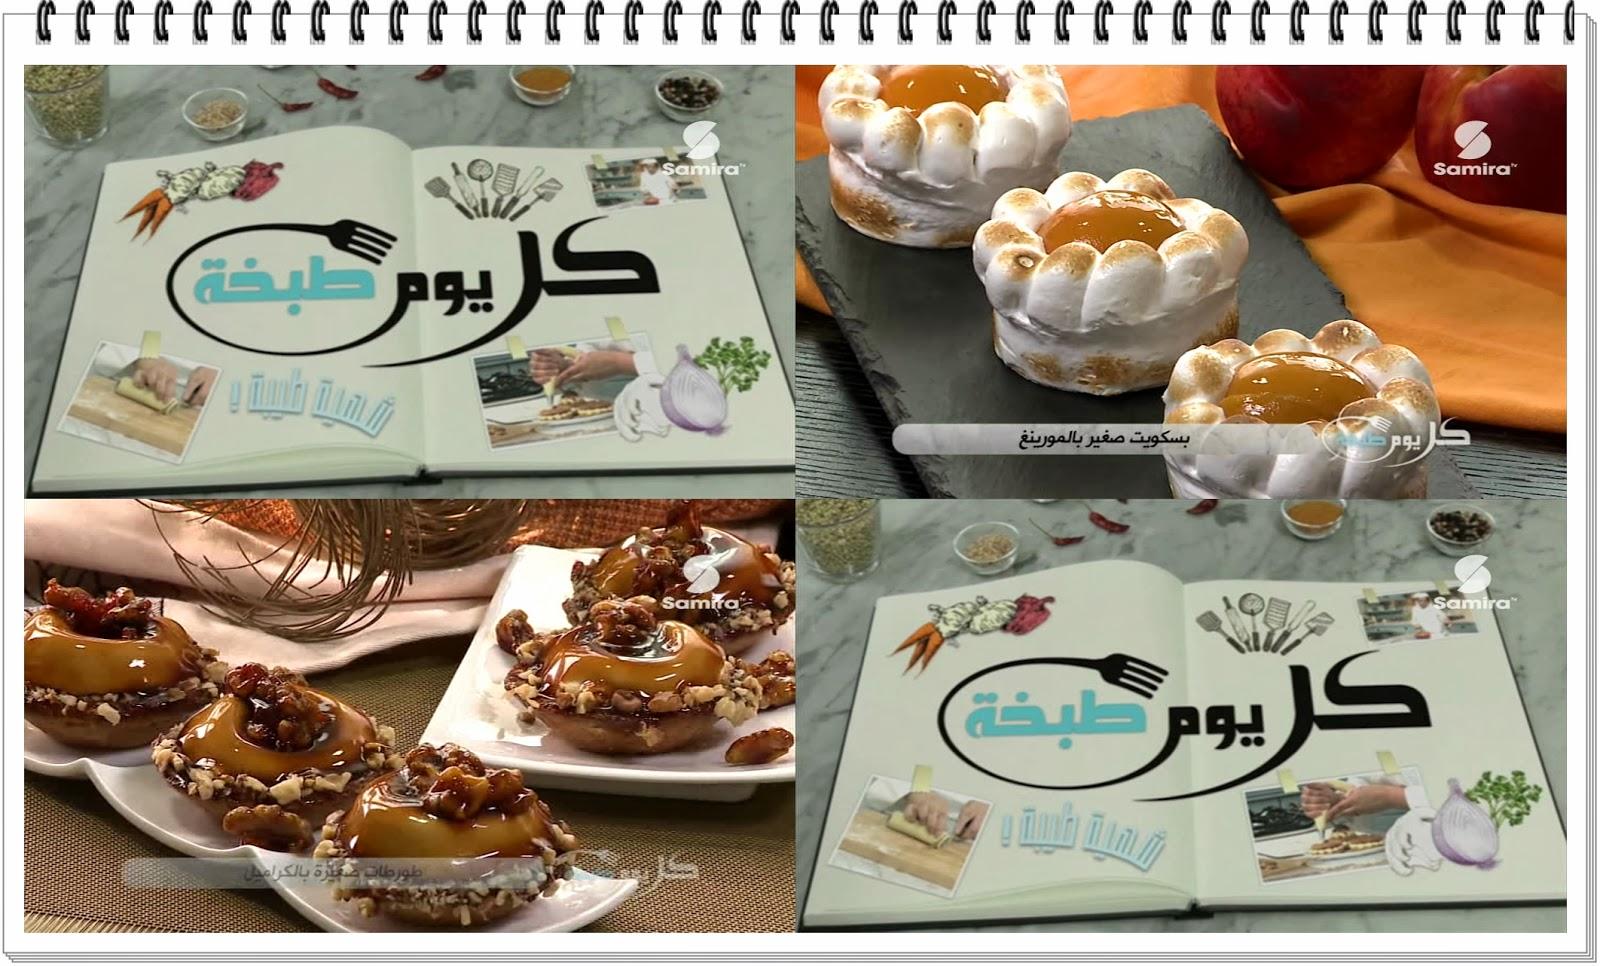 La cuisine alg rienne biscuits meringue et tourtes - Samira tv cuisine fares djidi ...